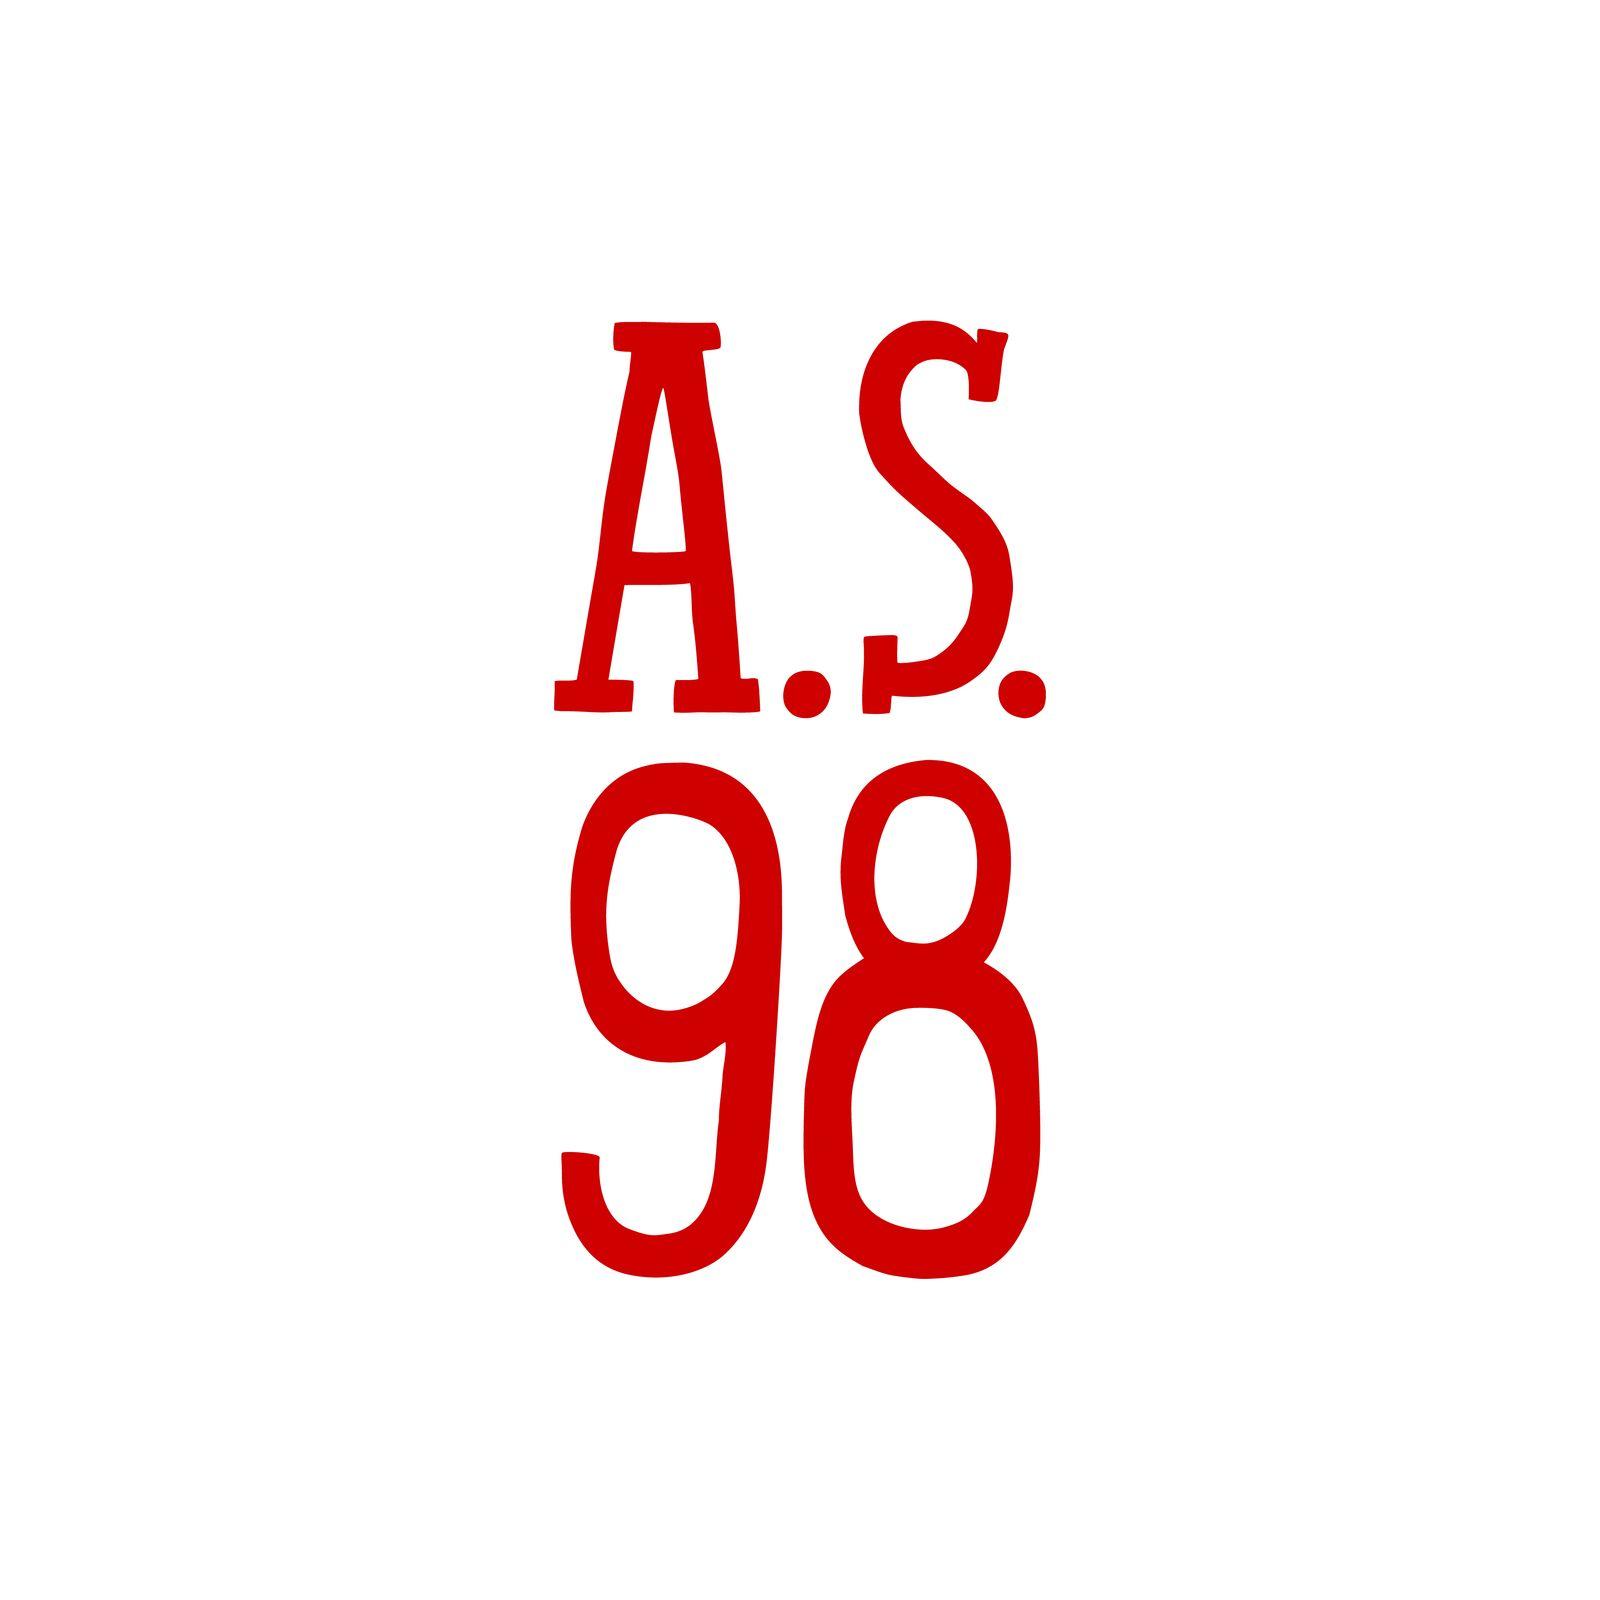 A.S.98 (Bild 1)